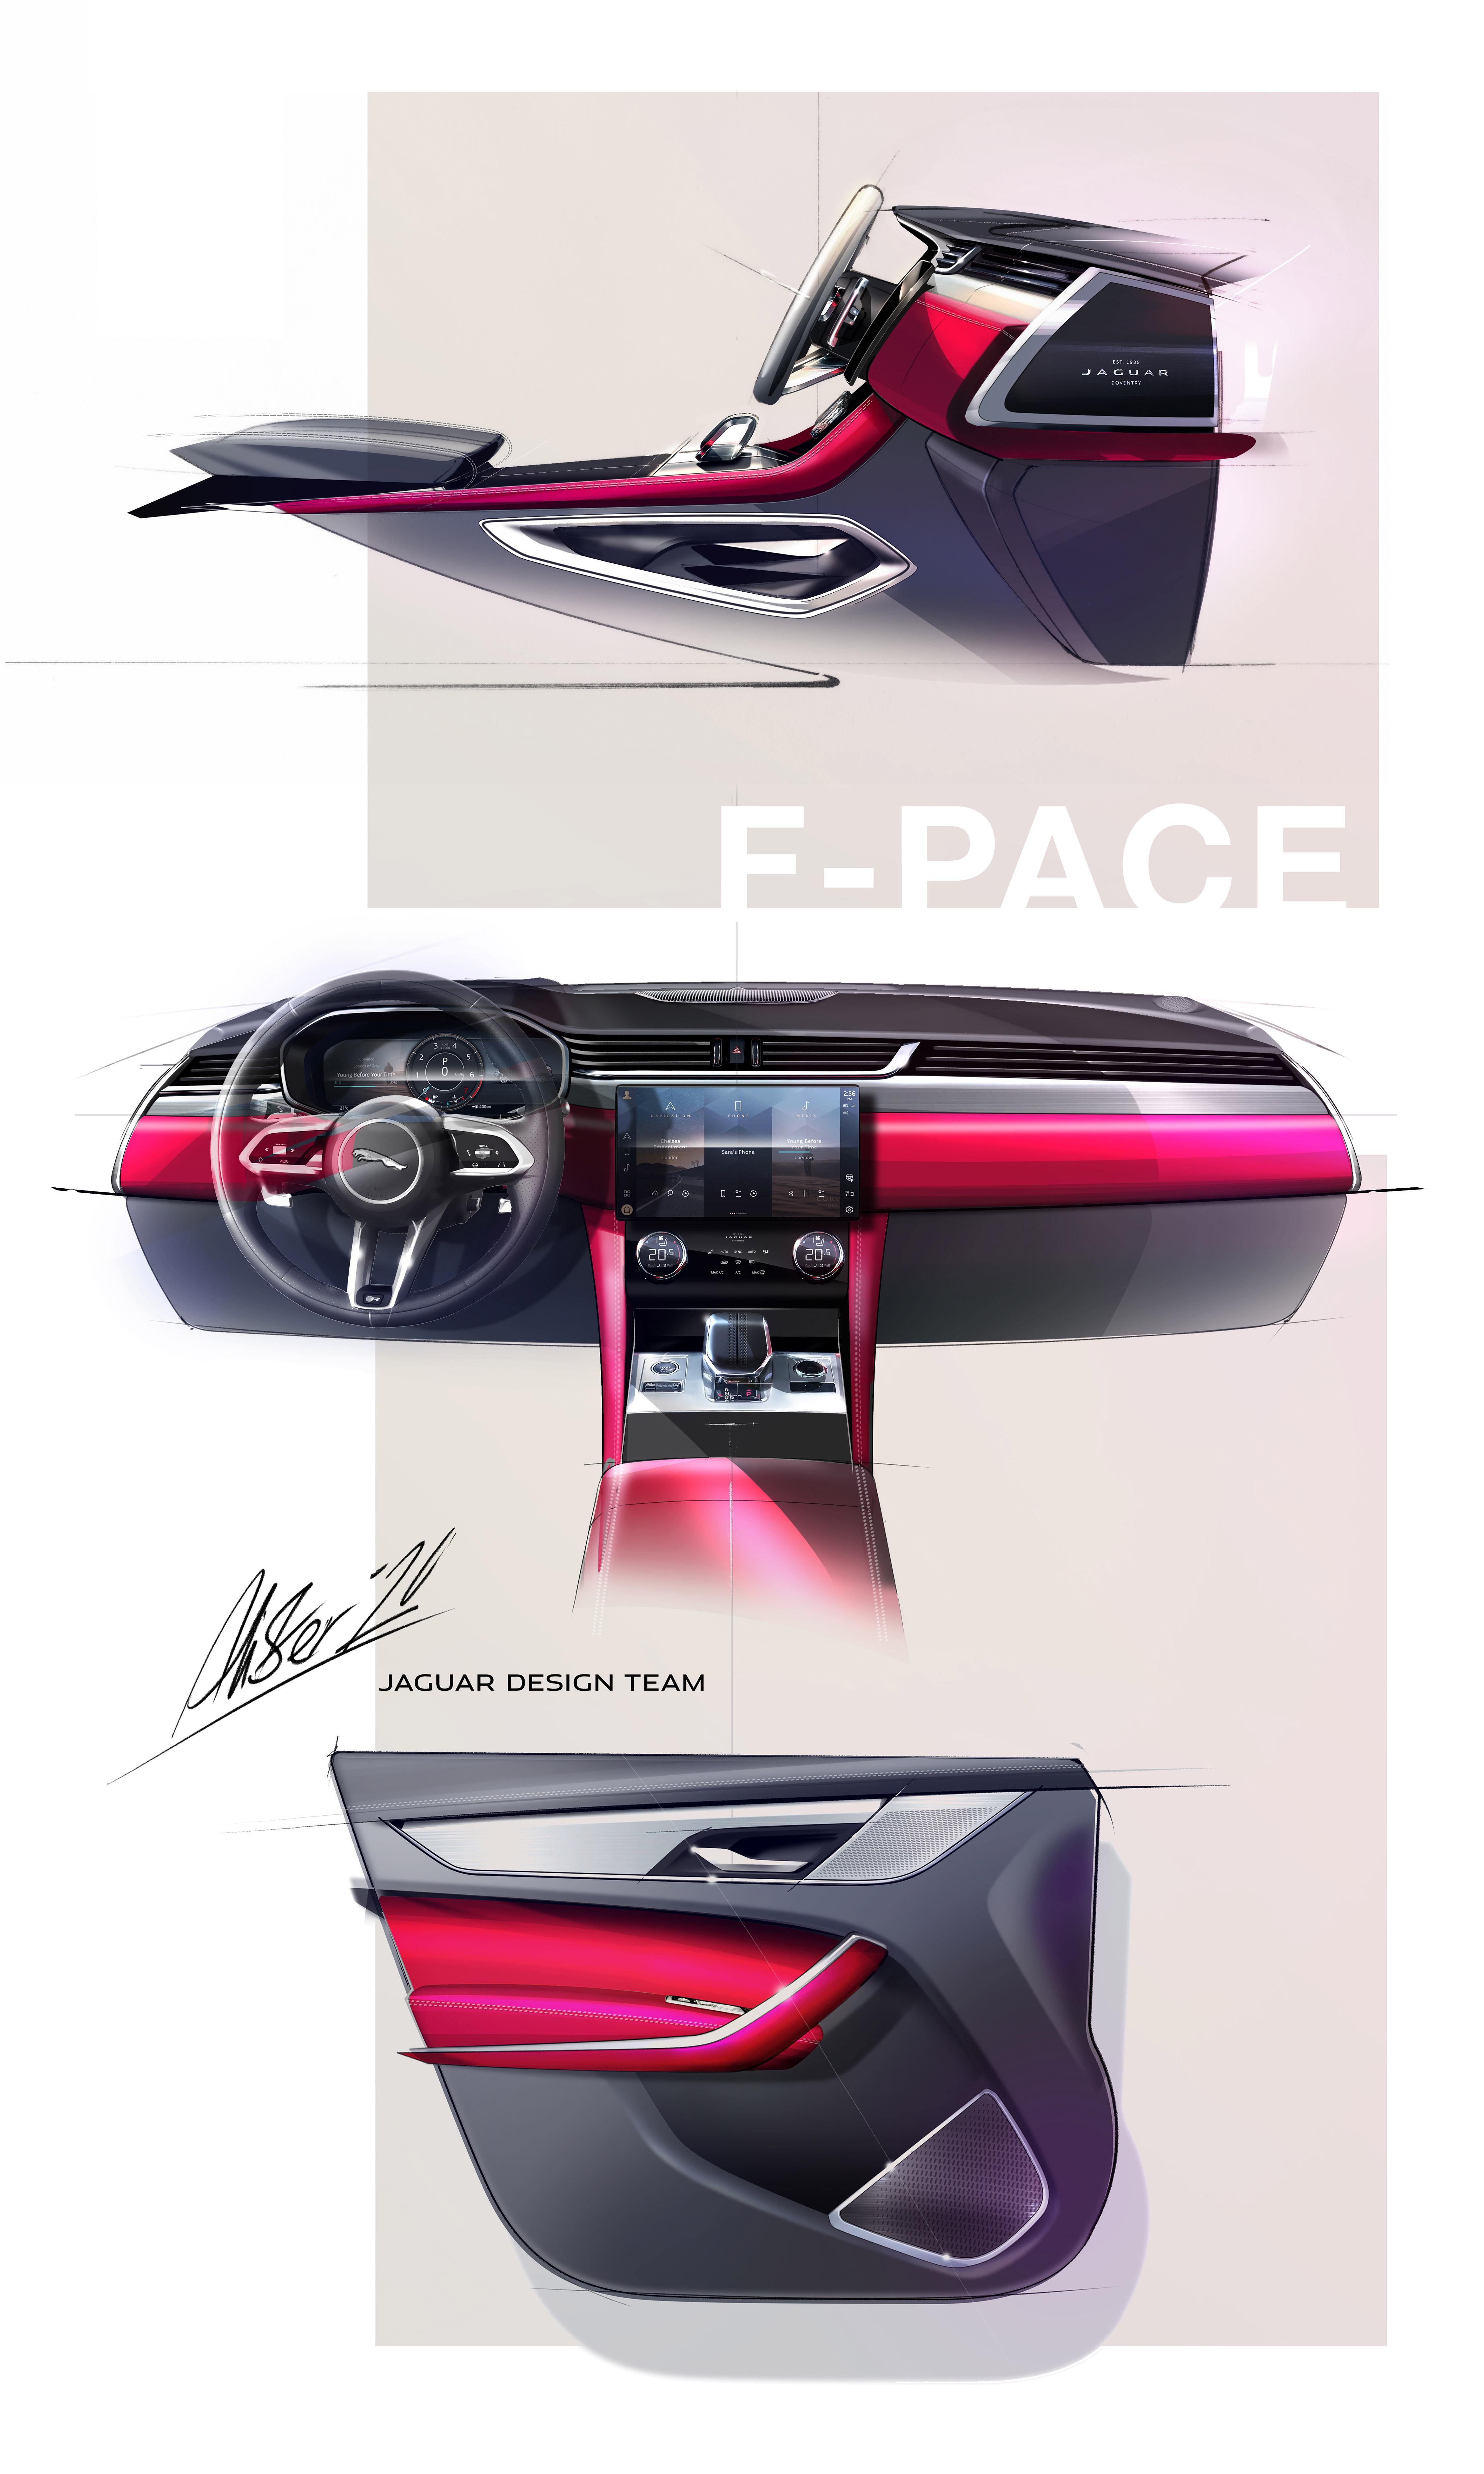 364553 jag f pace 21my design sketch interior 11 150920 a5adee original 1600091601